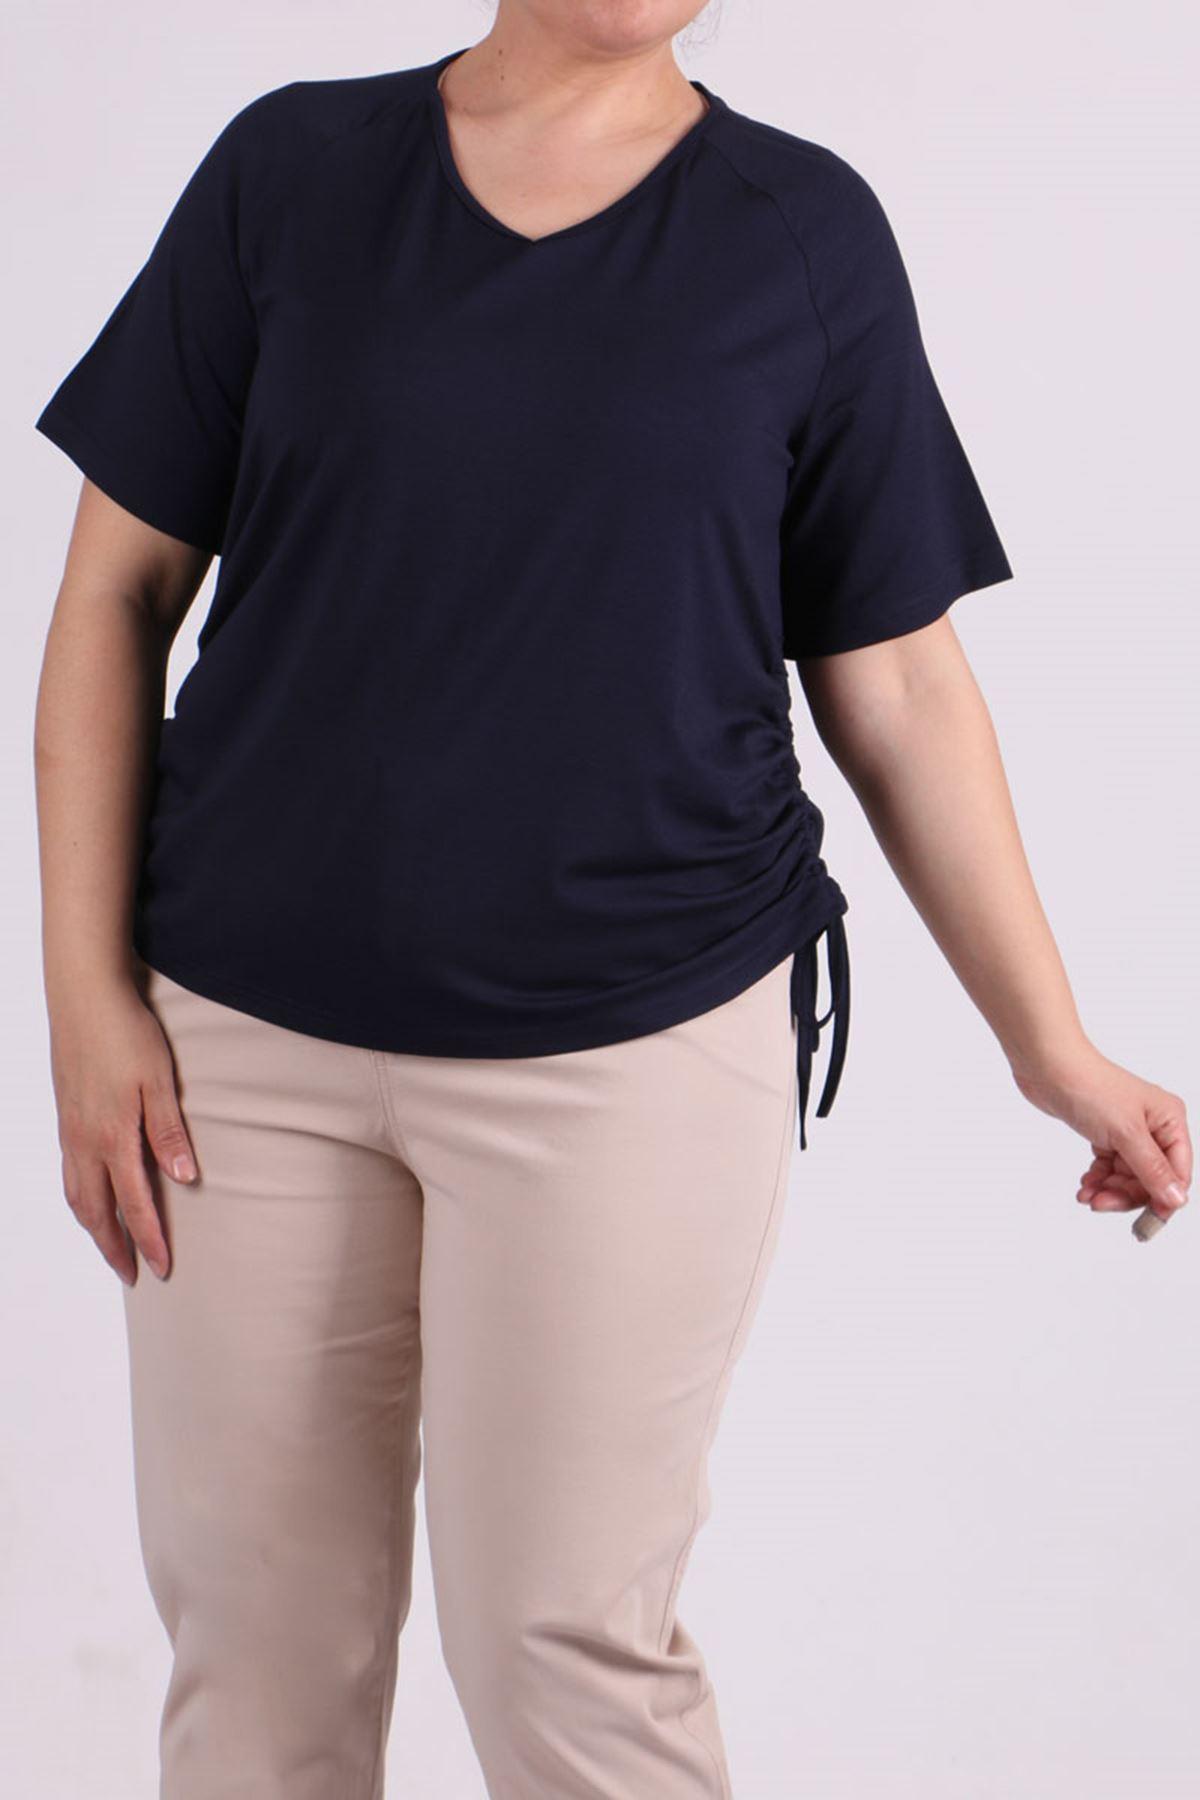 8530 Plus Size Raglan Sleeve T-Shirt - Navy Blue